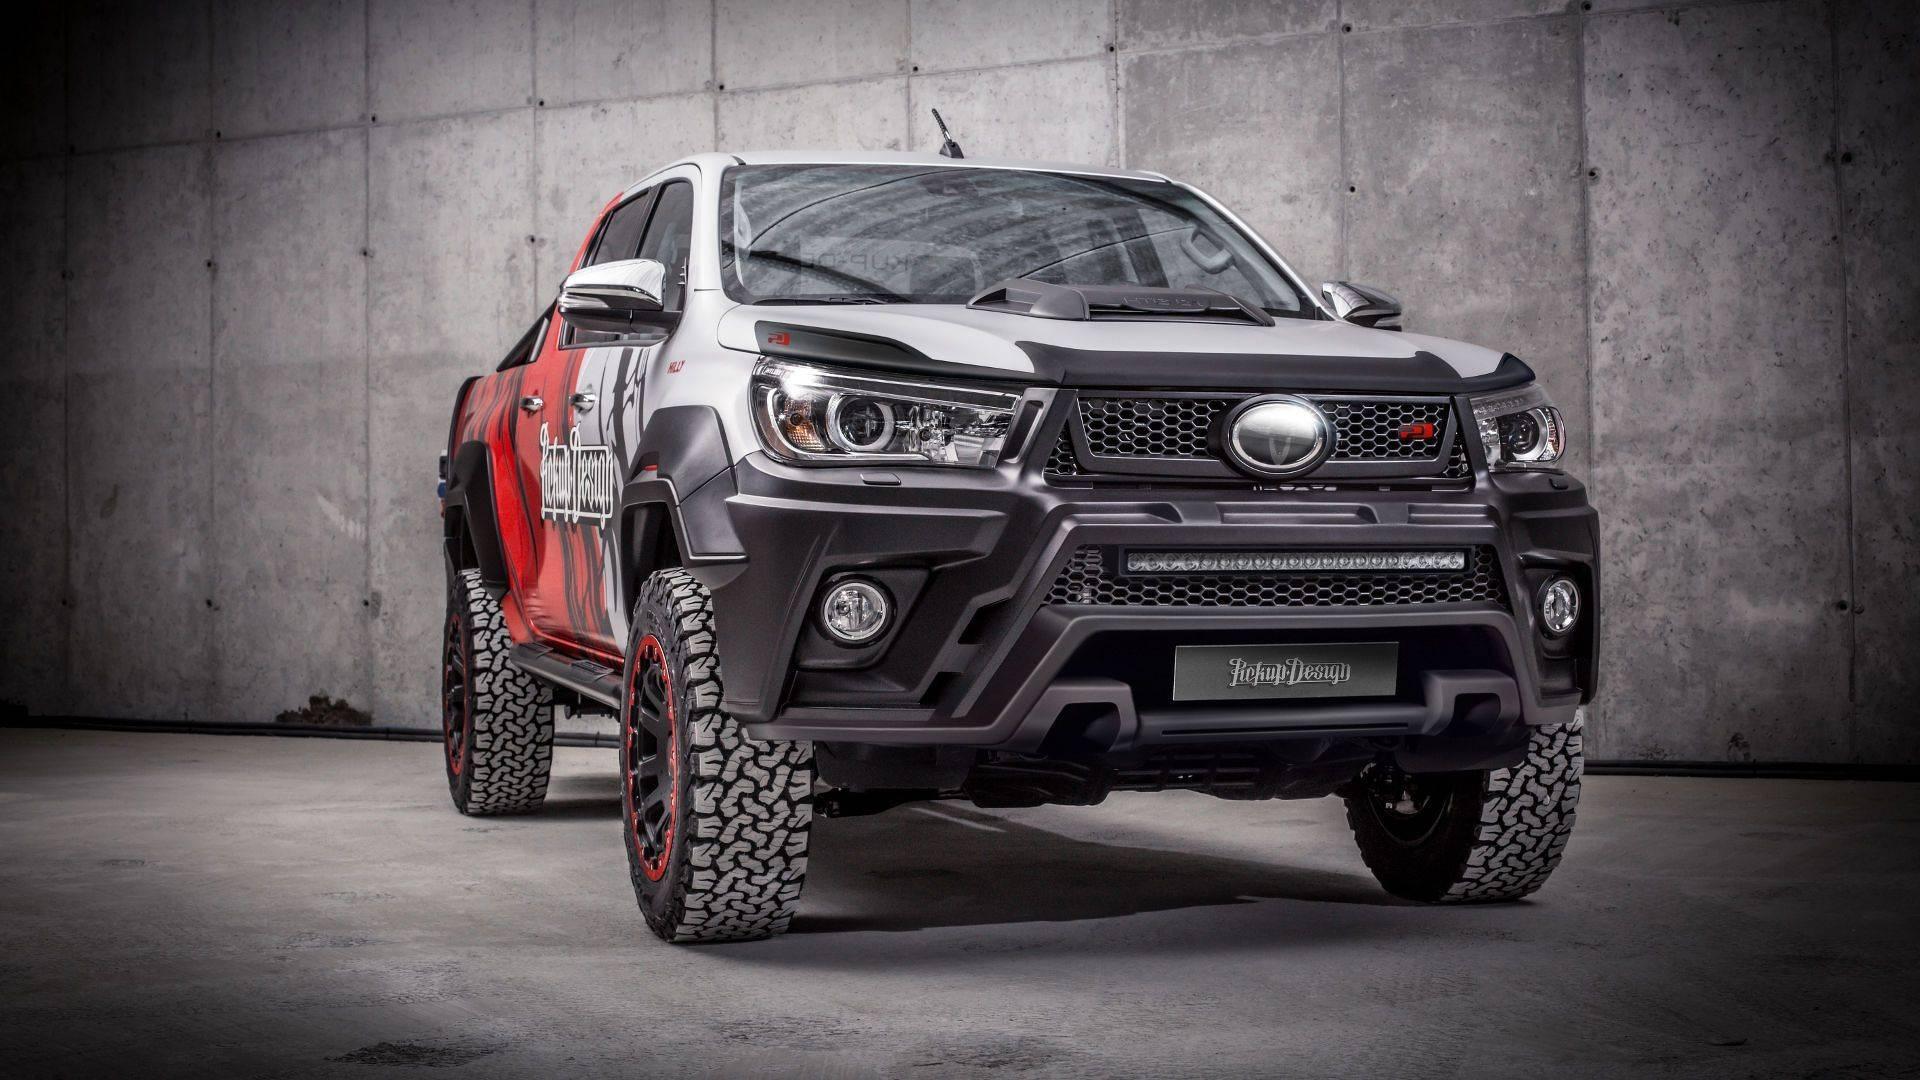 Toyota Hilux By Carlex Design Autoblog Gr